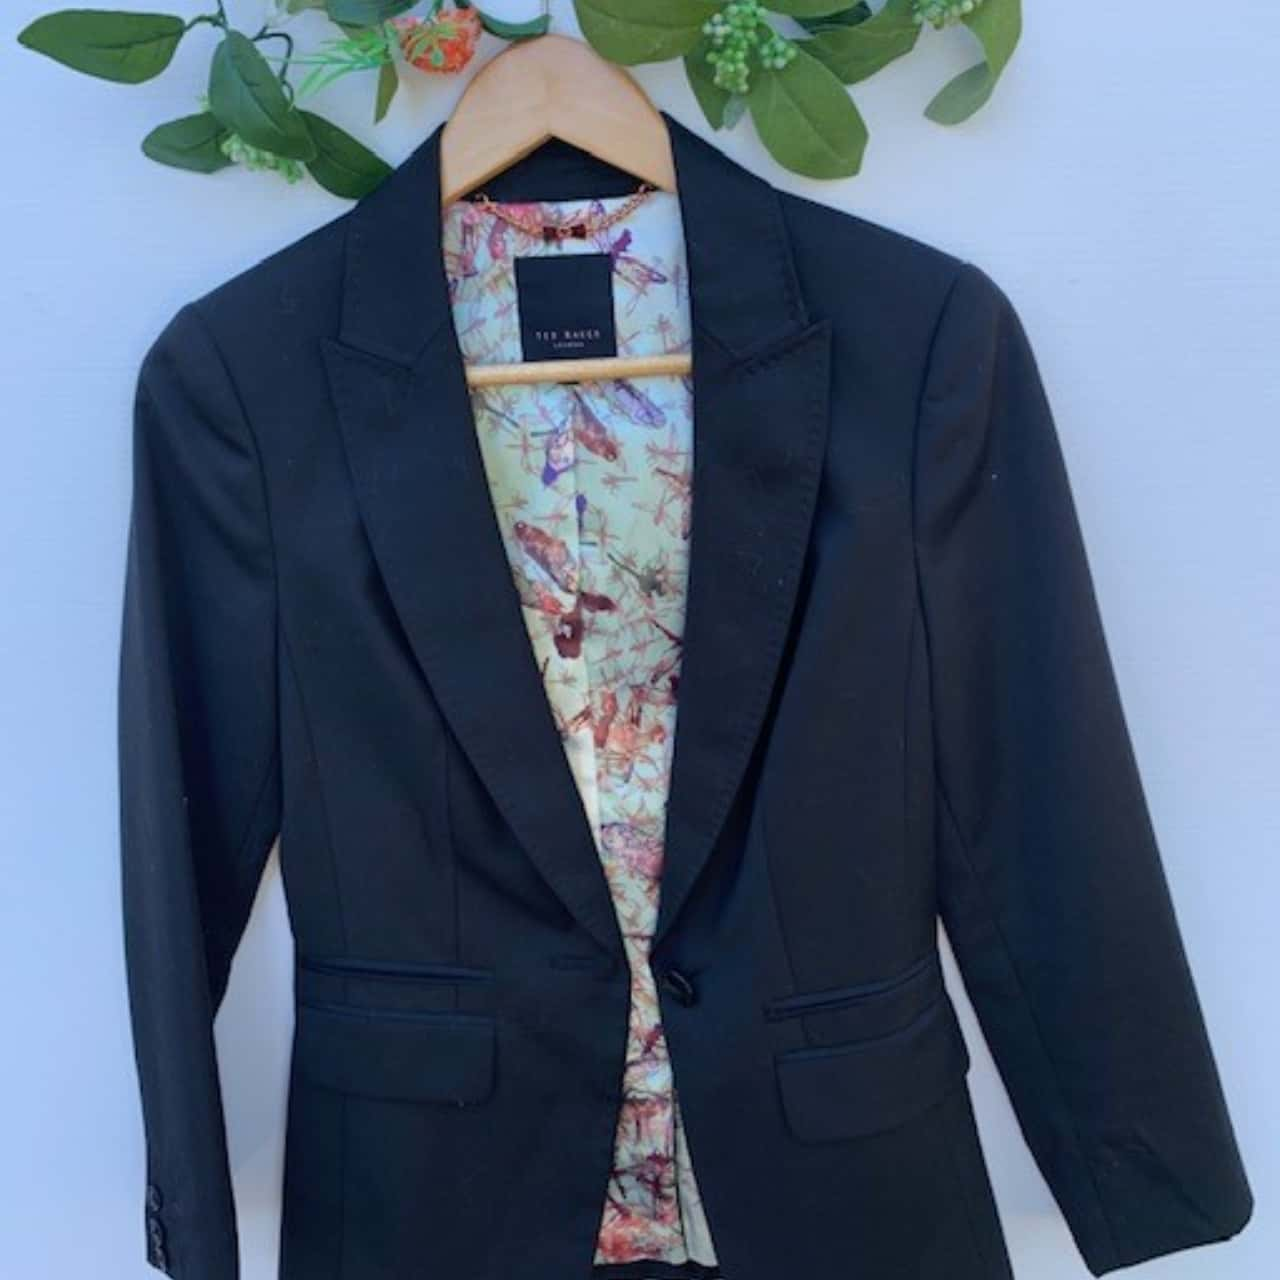 Ted Baker Womens Suit Black /Blue/Multicoloured